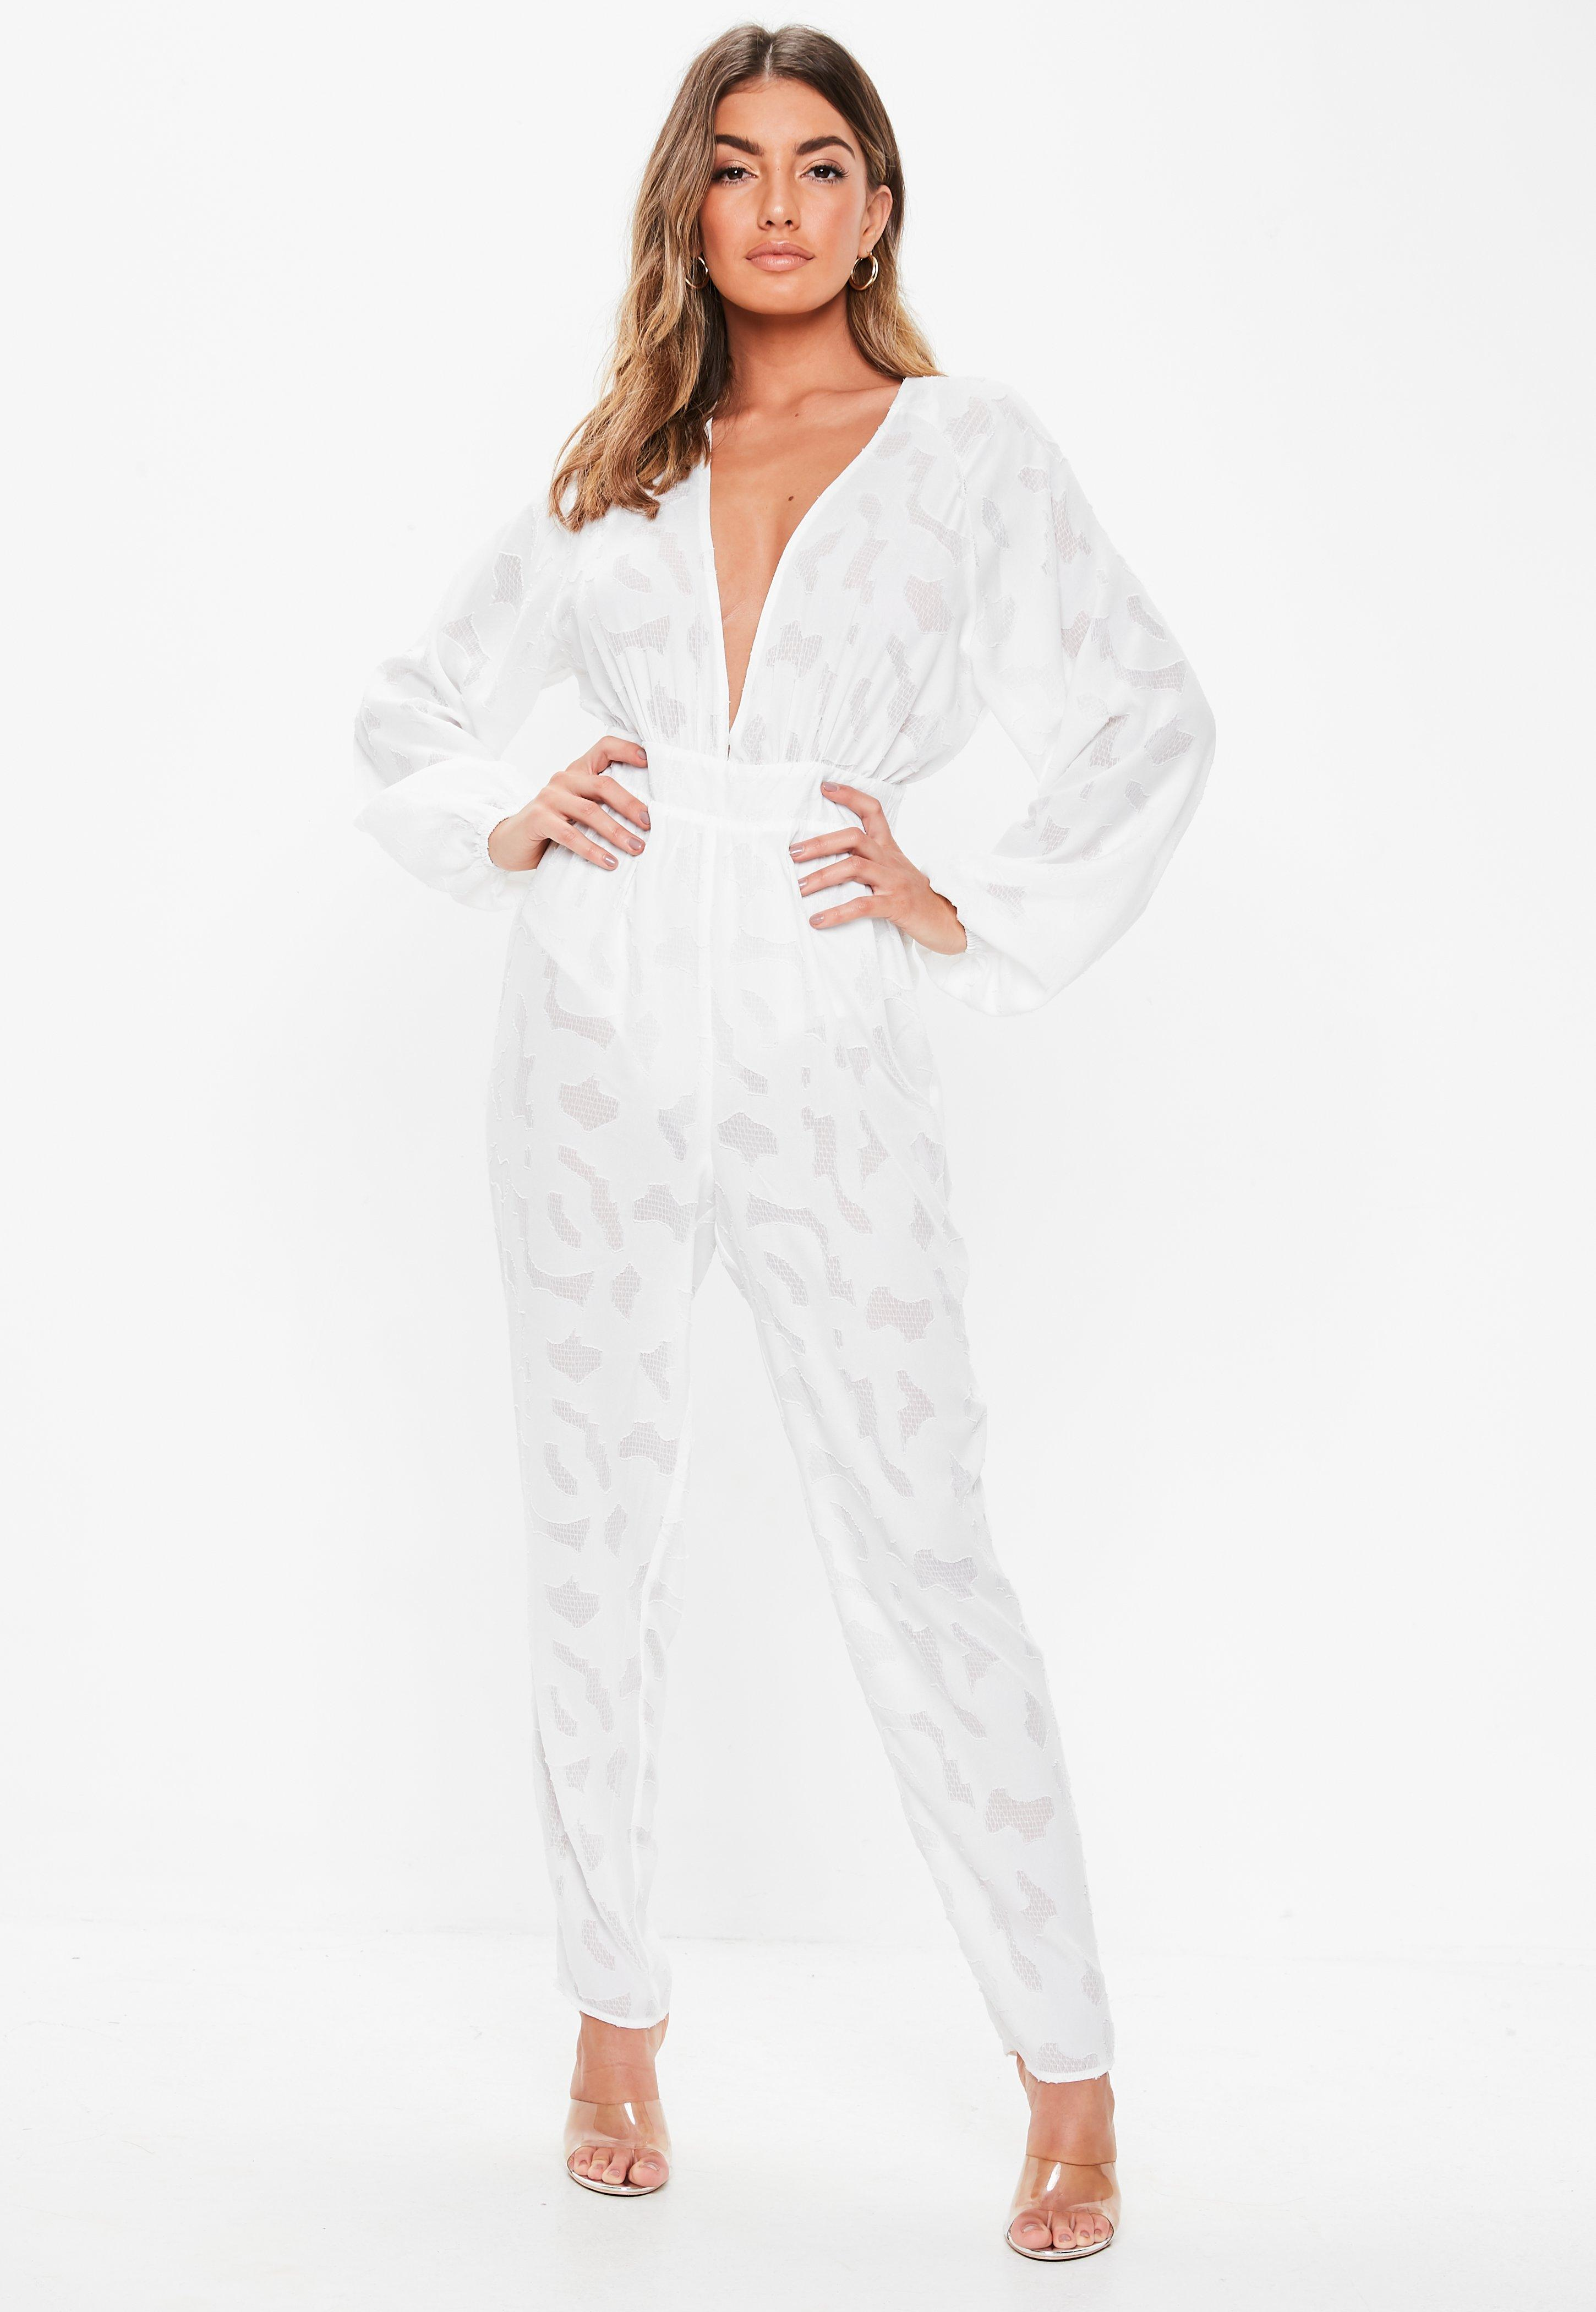 a61e266fe35 White Jumpsuits